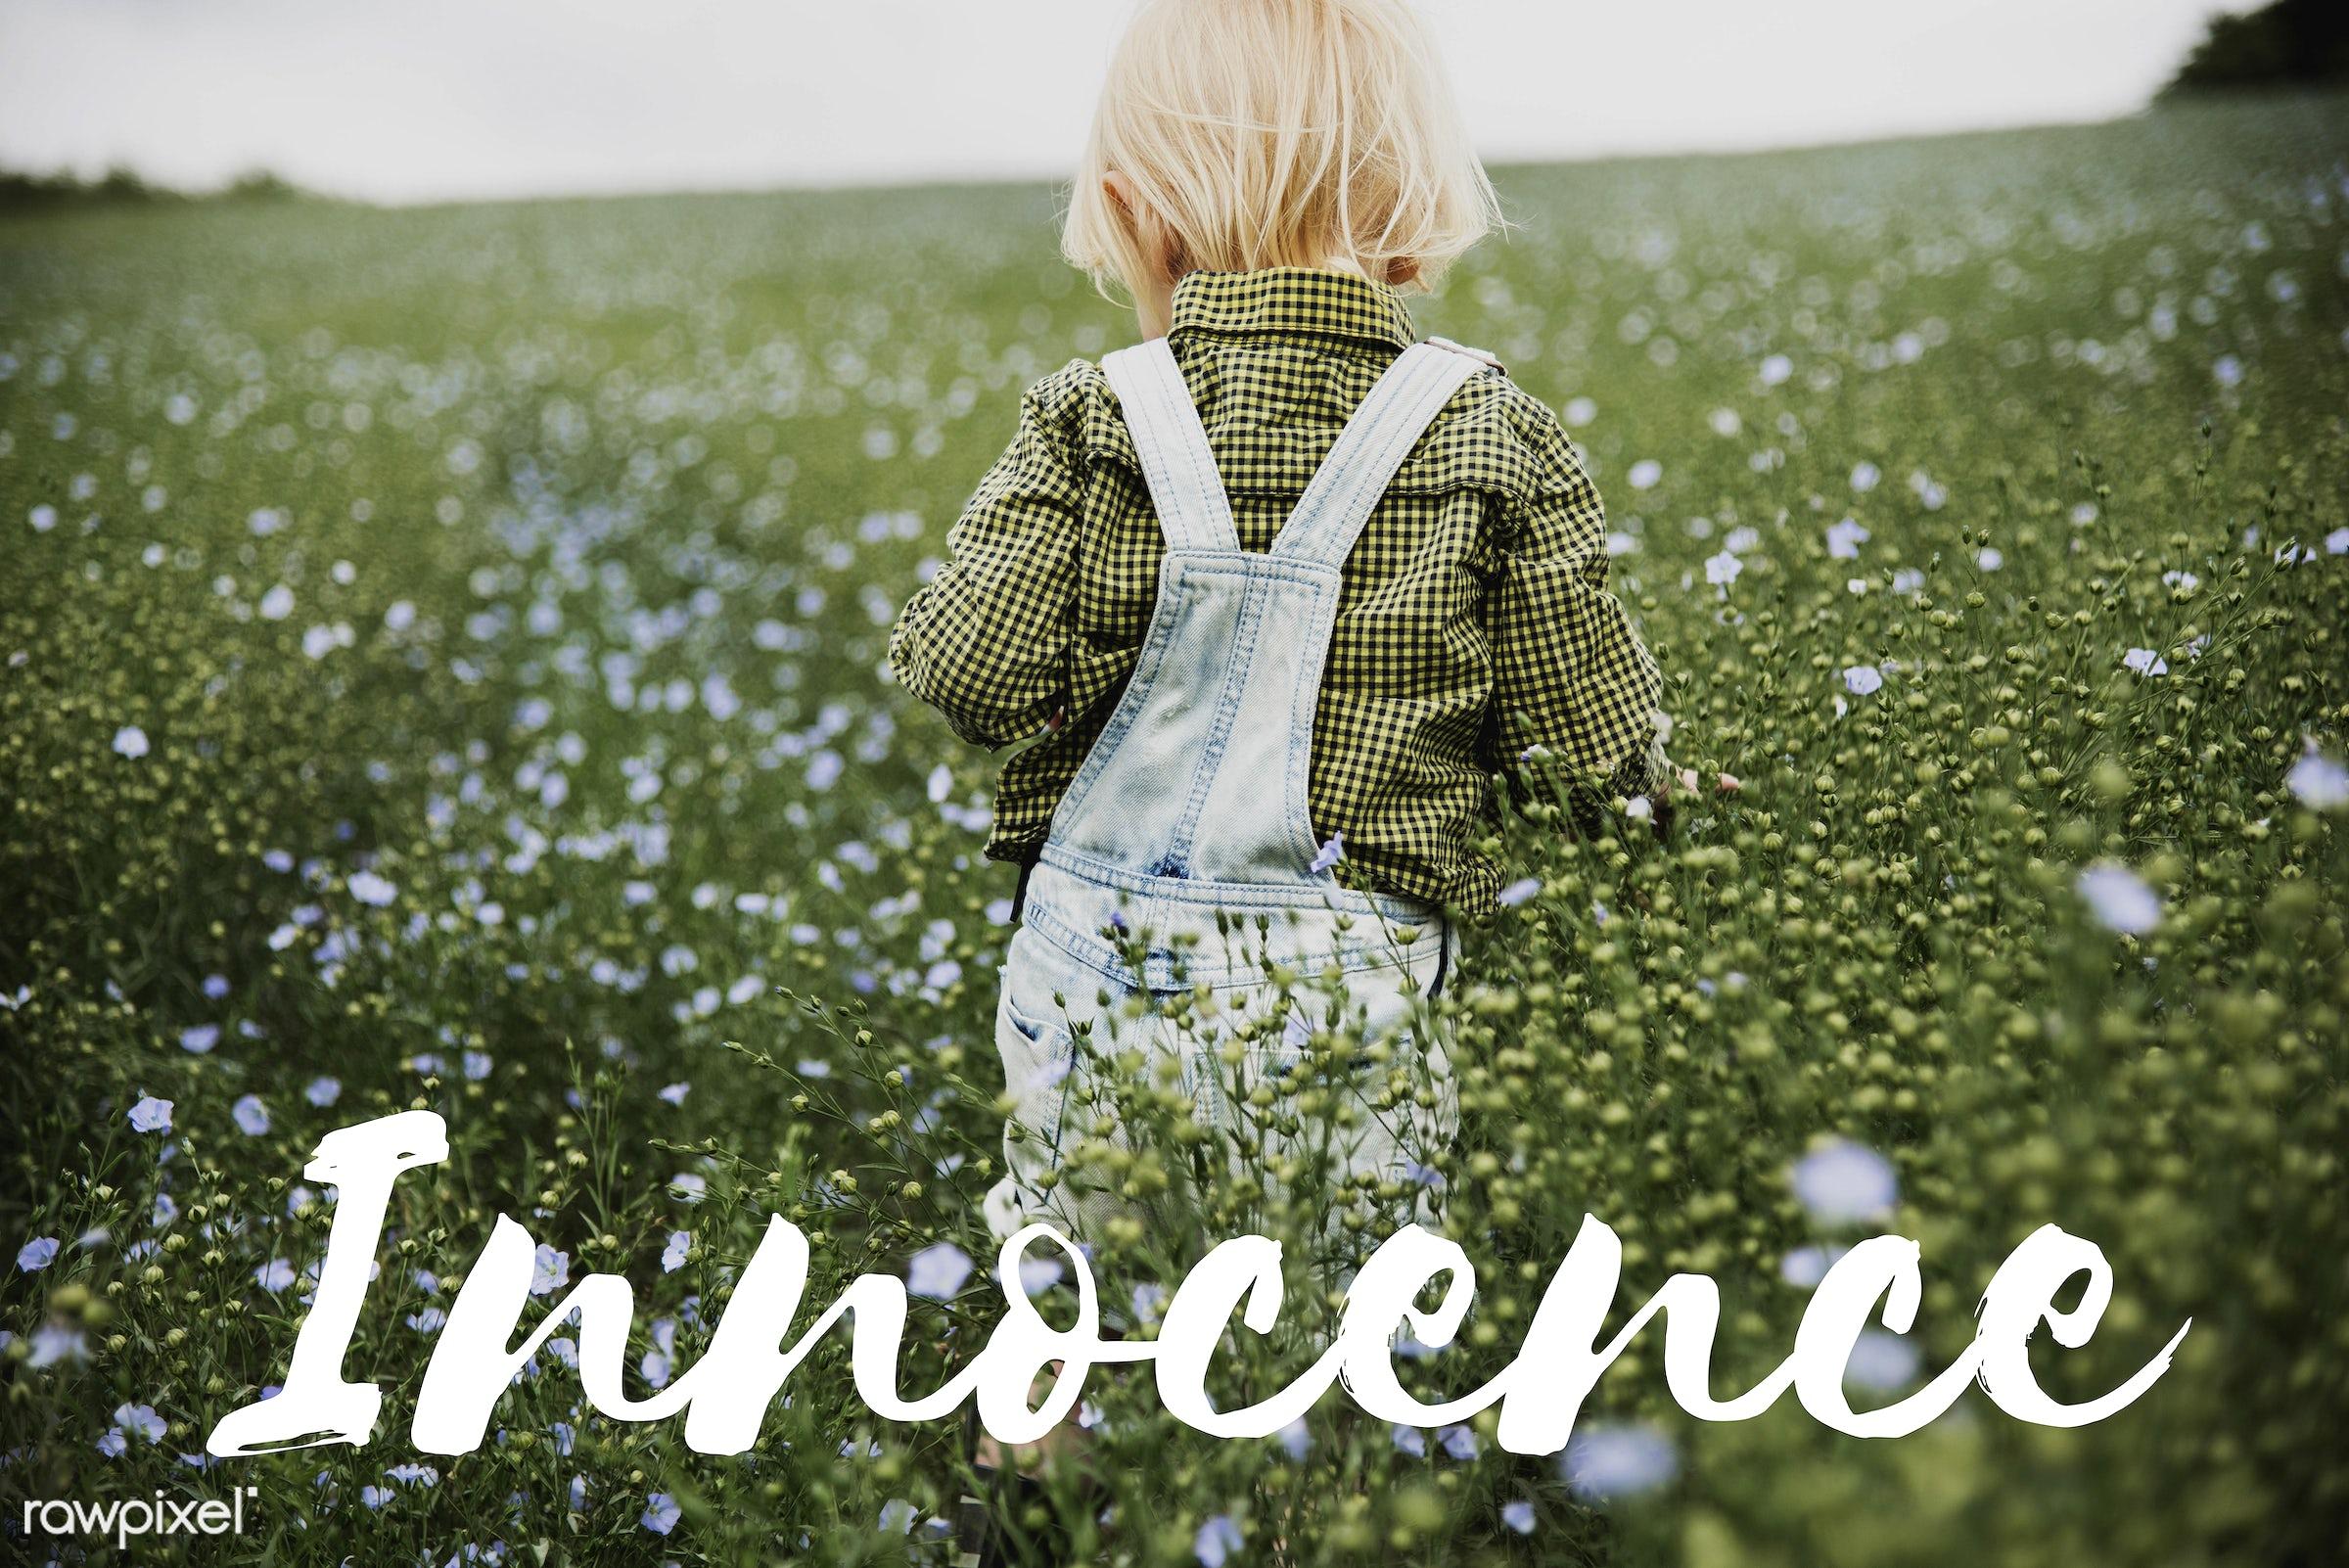 baby, child, adorable, blameless, blonde, boy, caucasian, childhood, children, curiosity, curious, cute, dungarees, flower...